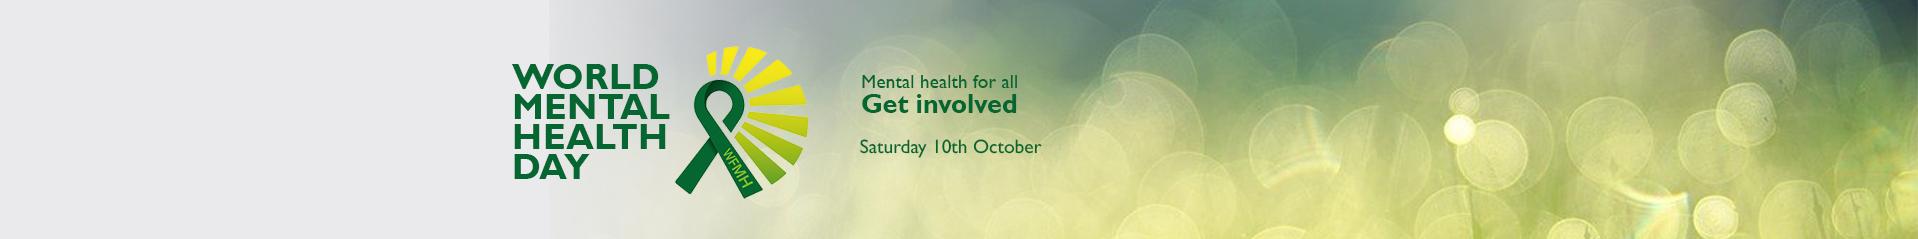 Mental health day header